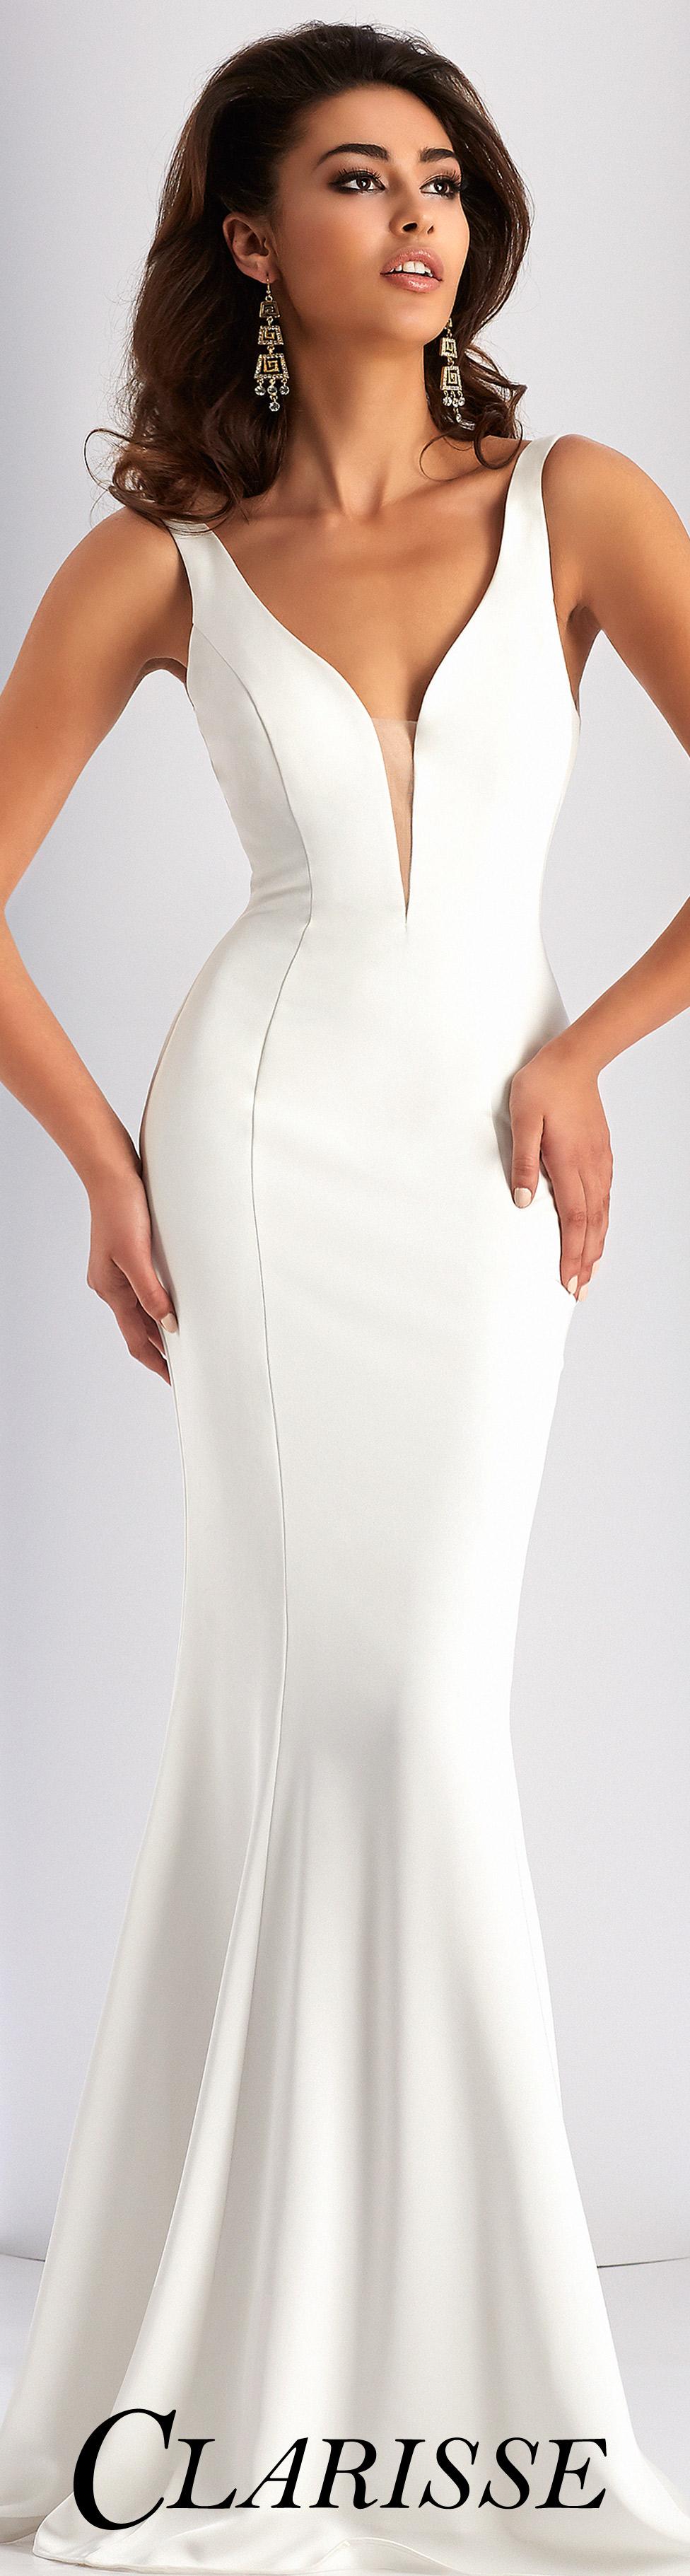 Clarisse prom dress simple sleeveless stretch satin dress with